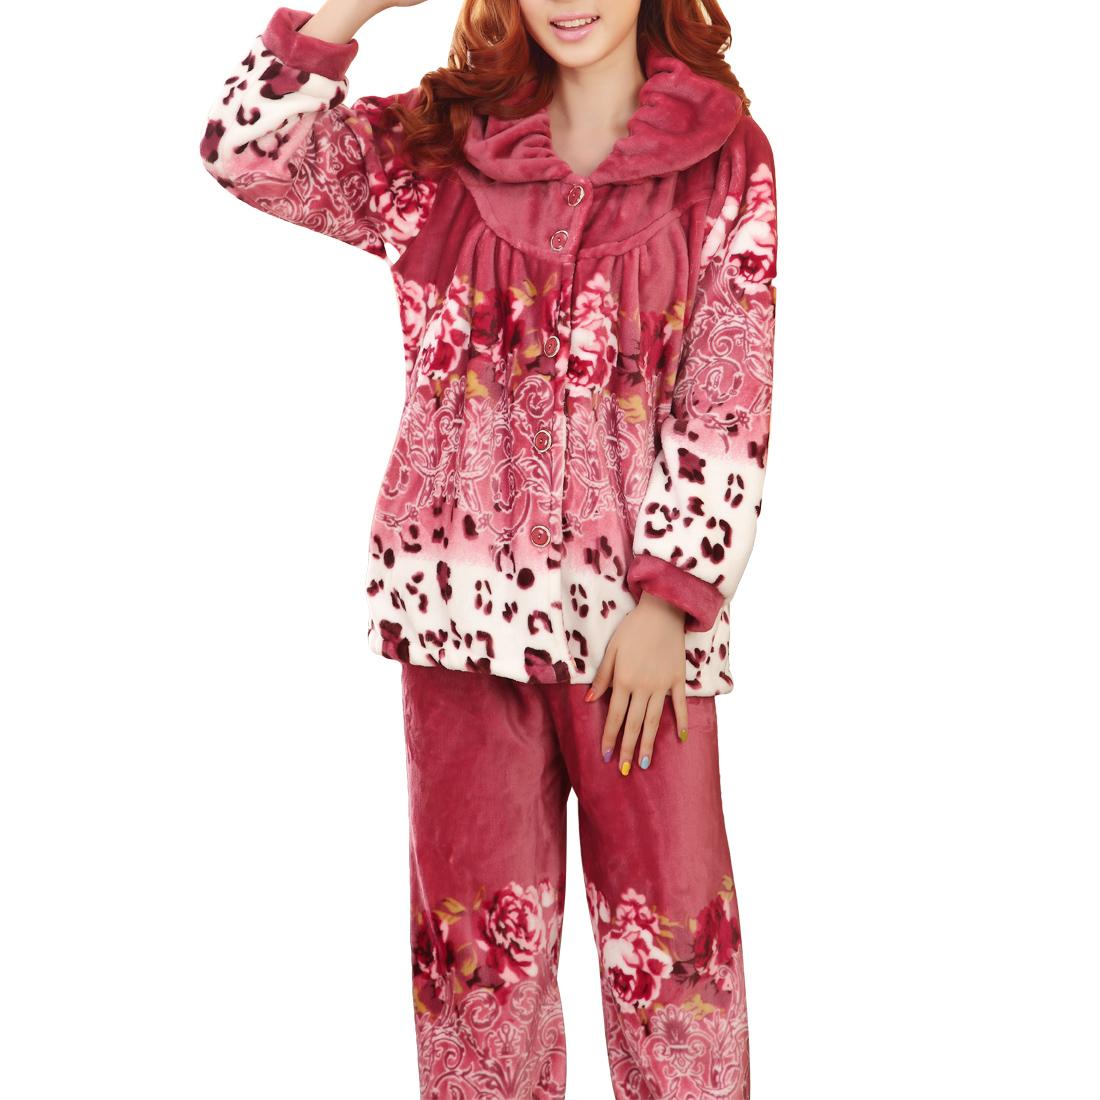 Winter Button Up Seam Pocket Sleepwear Pajama Sets Amaranth L for Woman